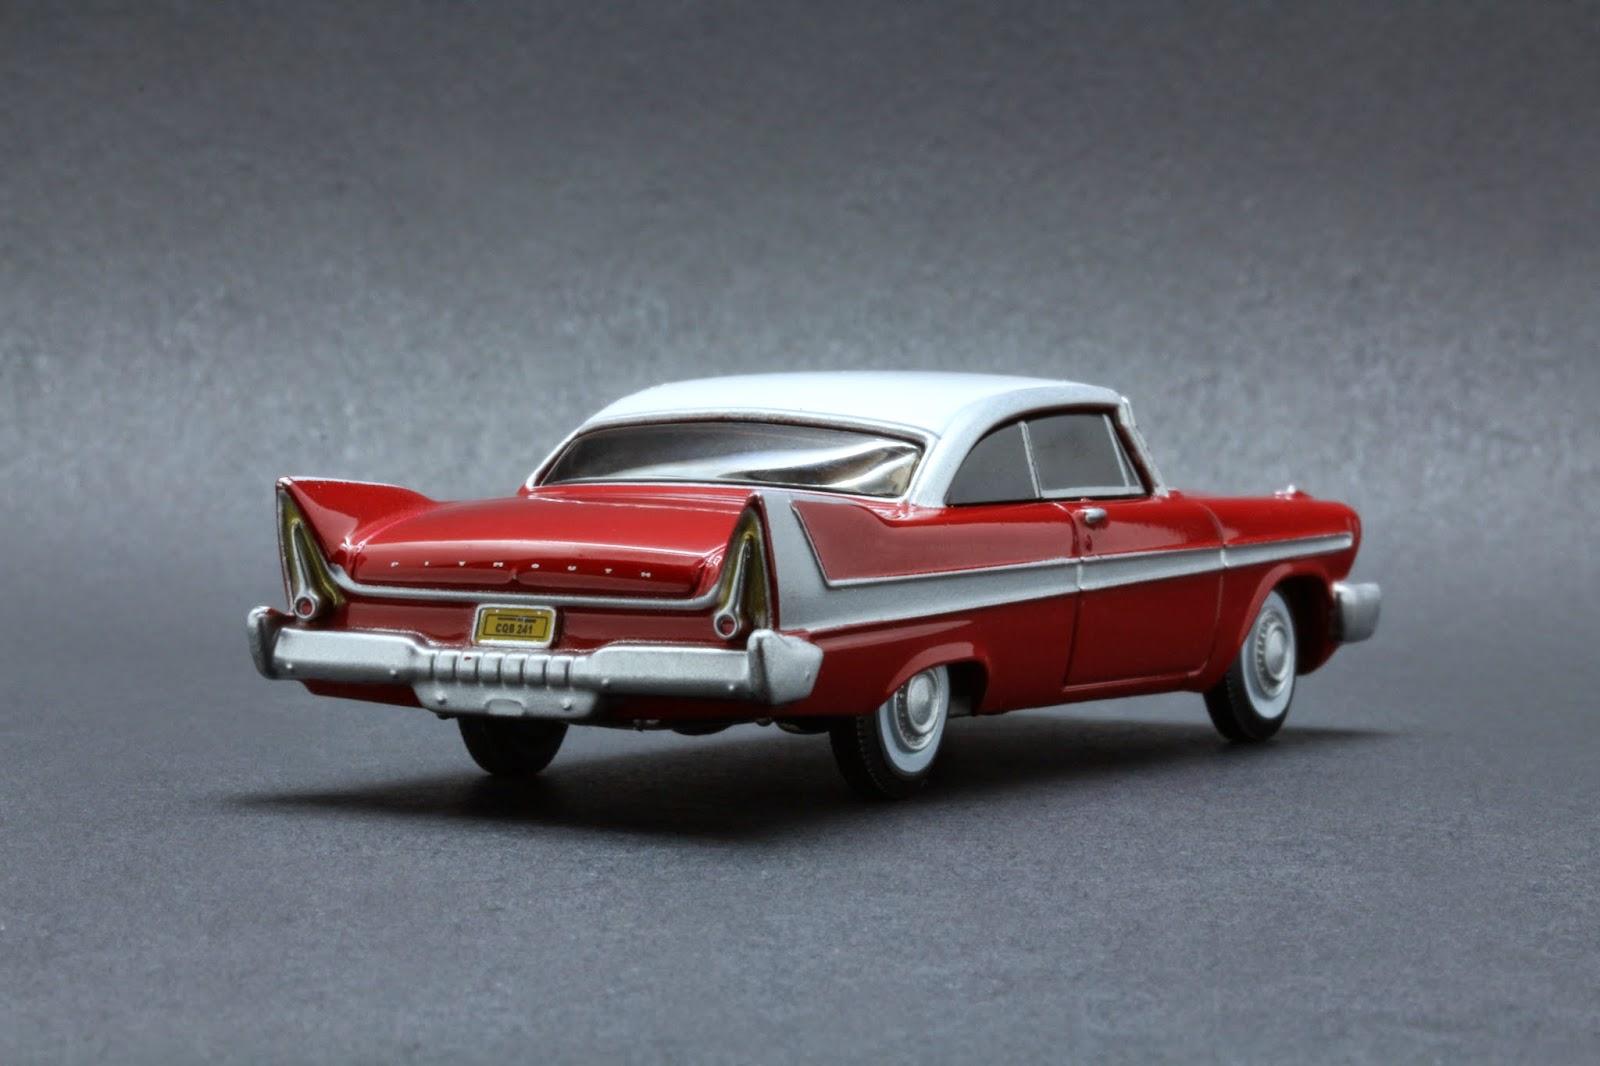 Diecast Hobbist 1958 Plymouth Fury Christine